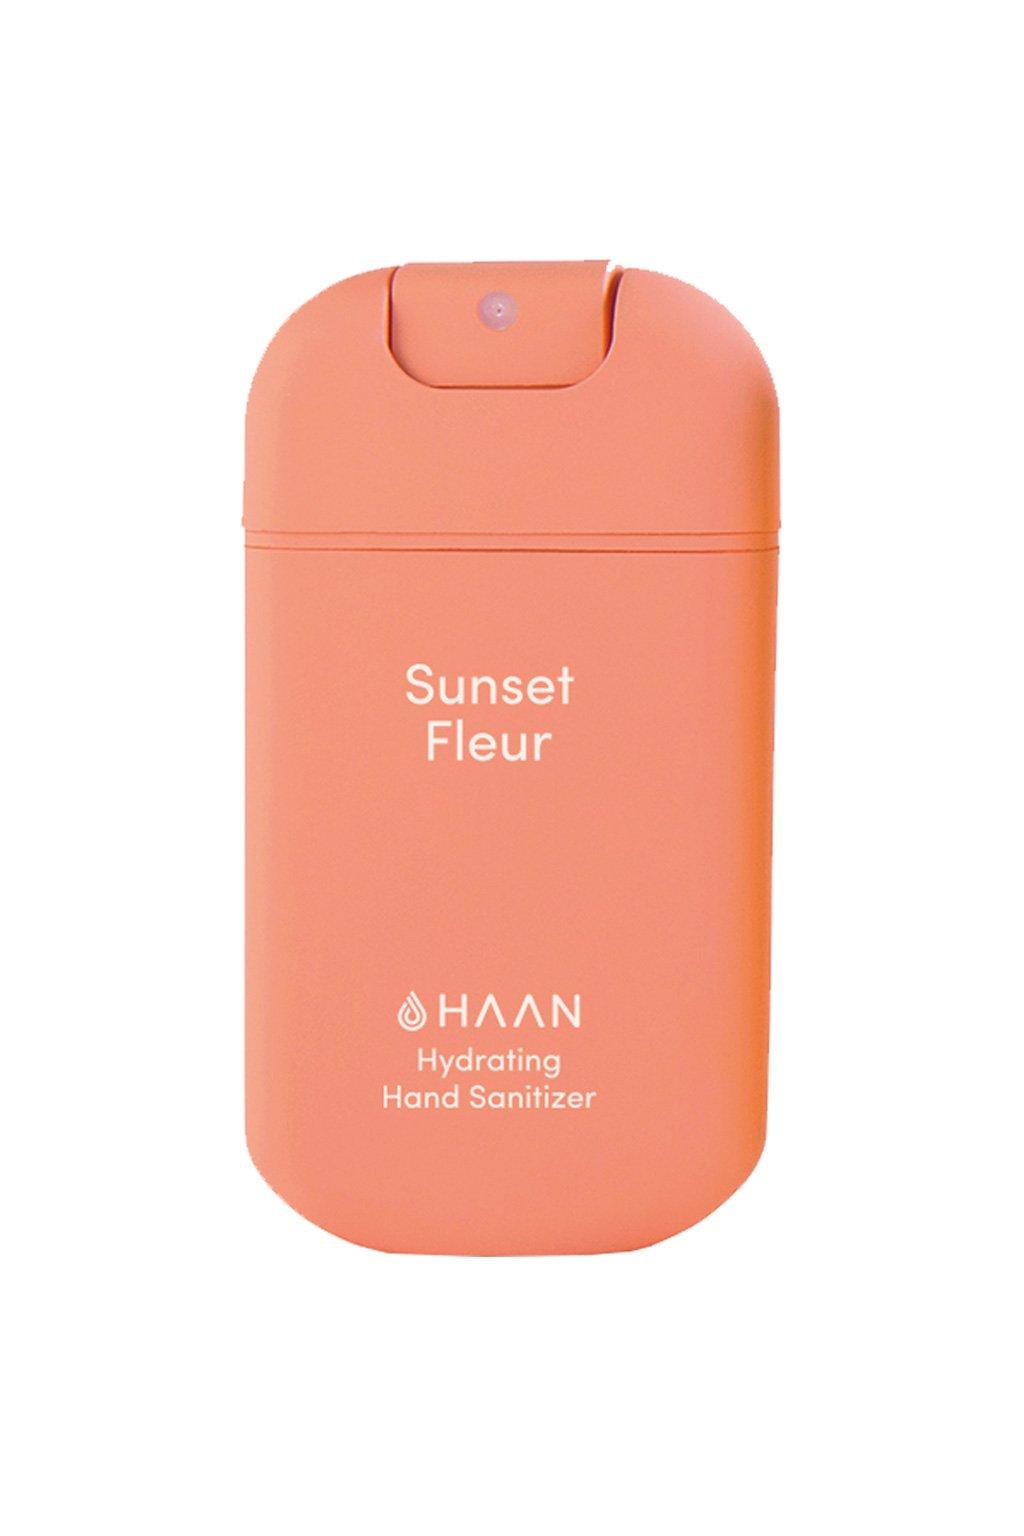 HAAN Sunset Fleur antibakteriální čisticí sprej na ruce